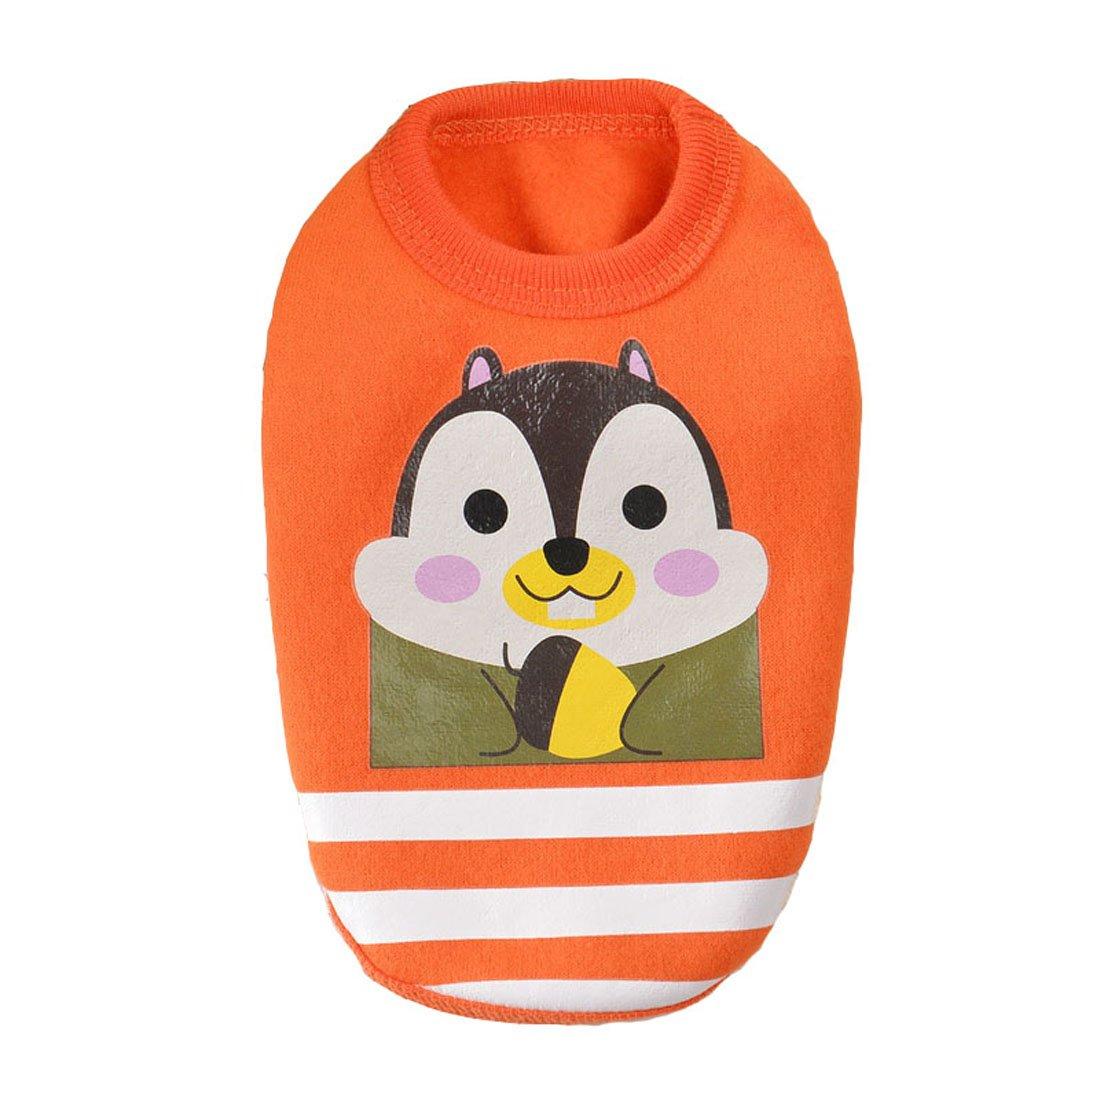 a3606d8df7bb Amazon.com : MD New Striped Cartoon Animal Sweater Baby Pet Clothes Dog  Clothing Puppy Winter Warm Sweater (XXXS, Orange) : Pet Supplies